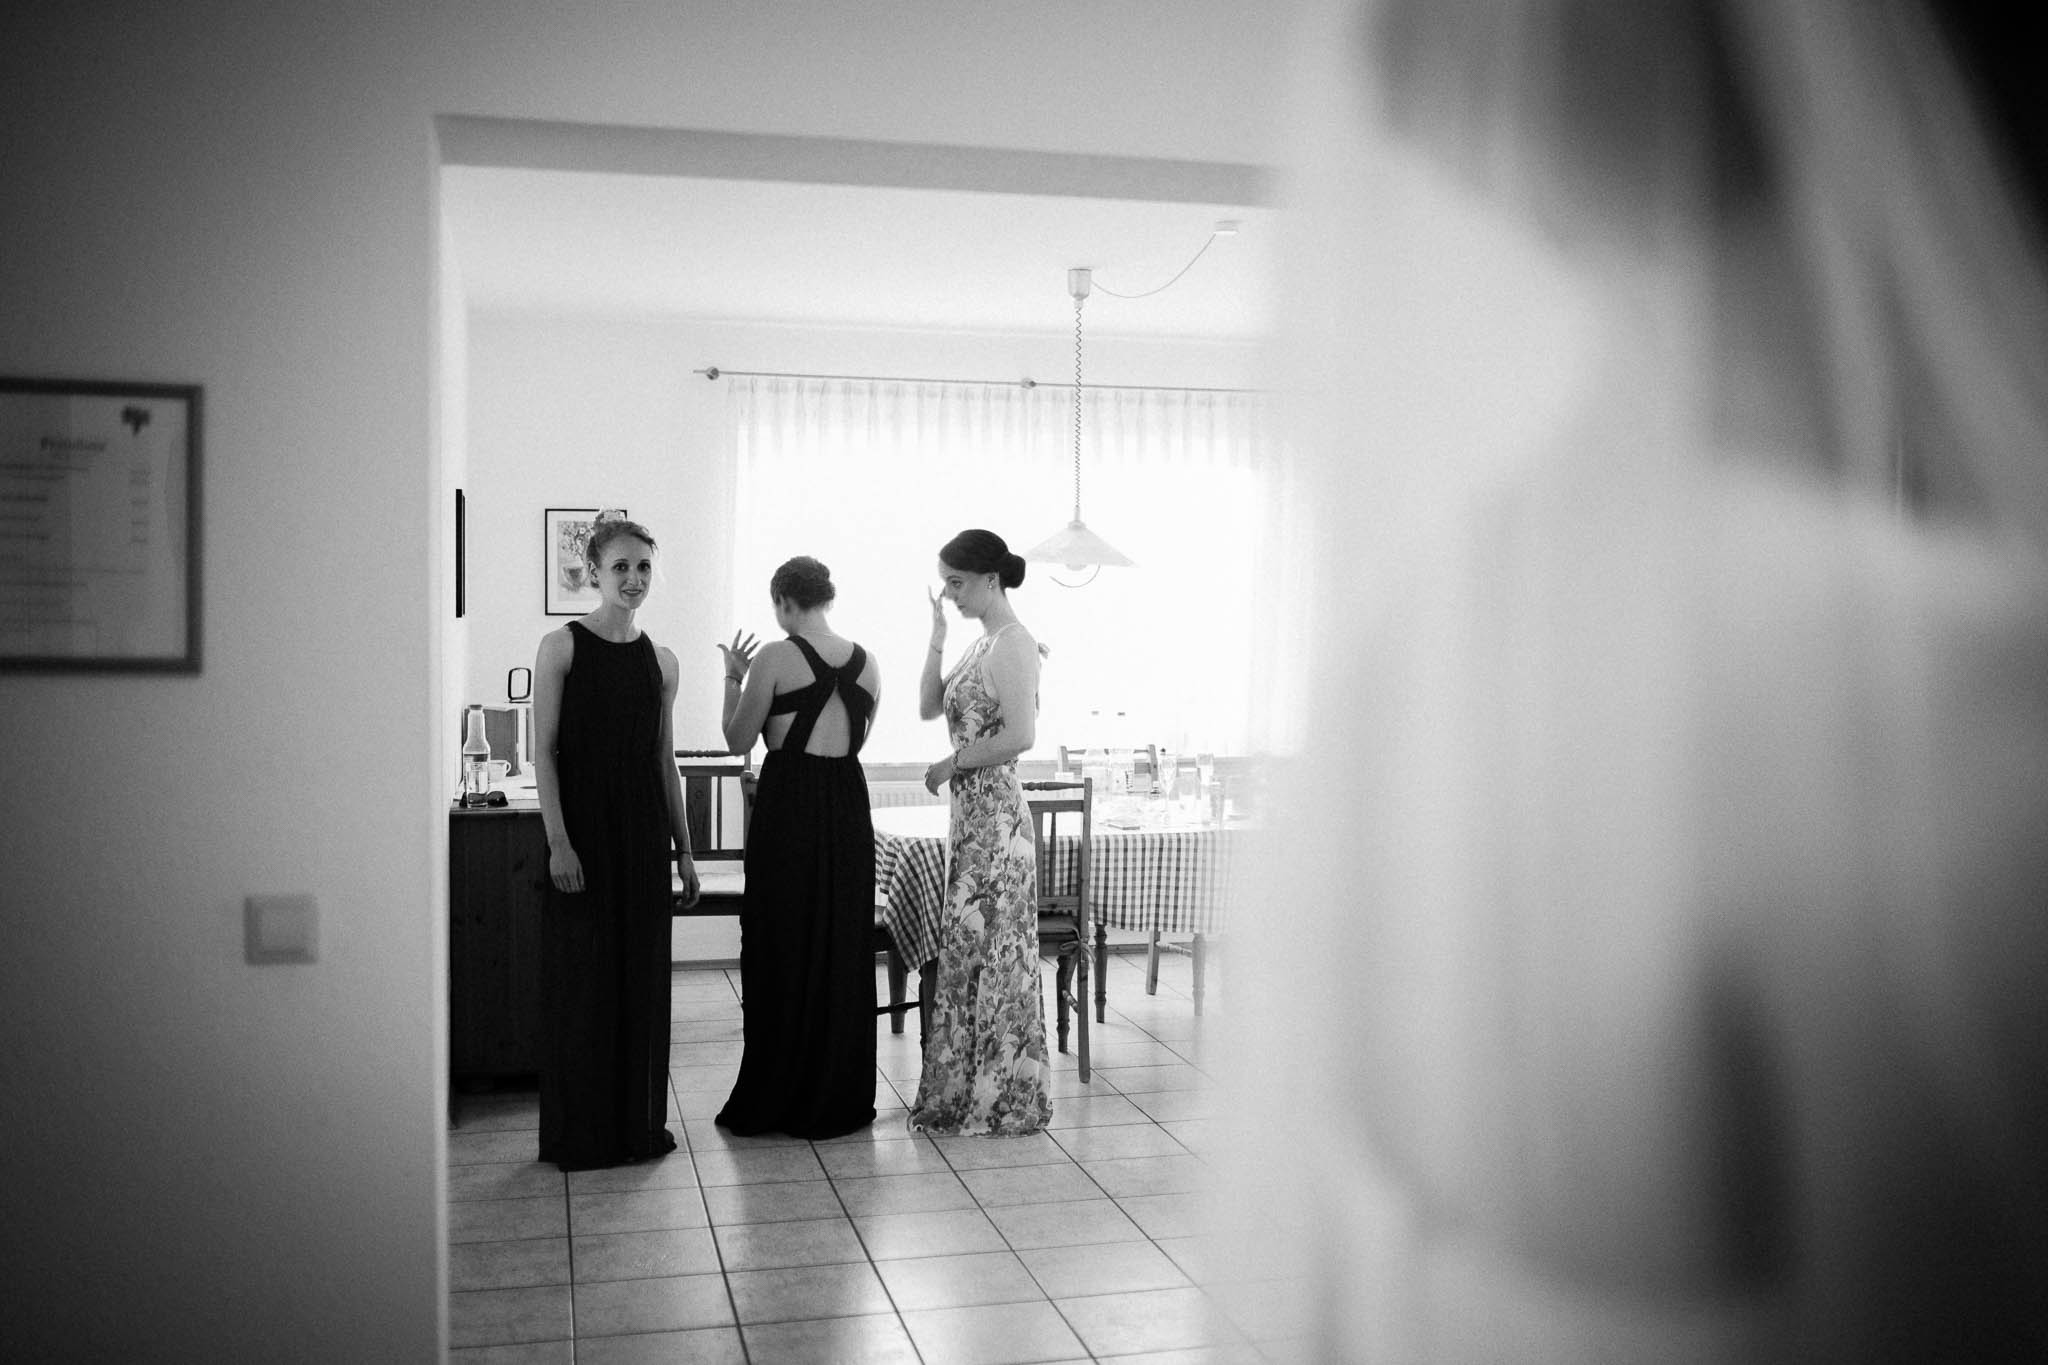 Freie Trauung Großkarlbach: Flo & Andi 40